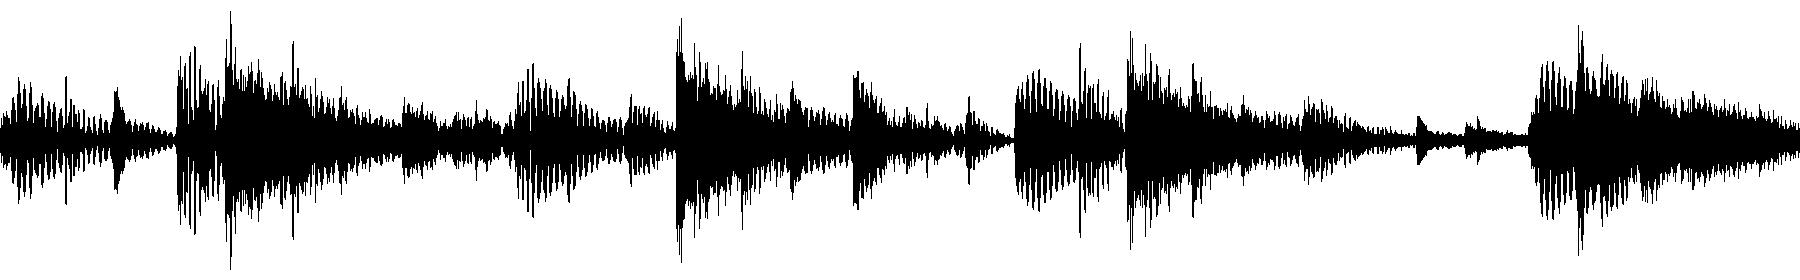 g abs05 061